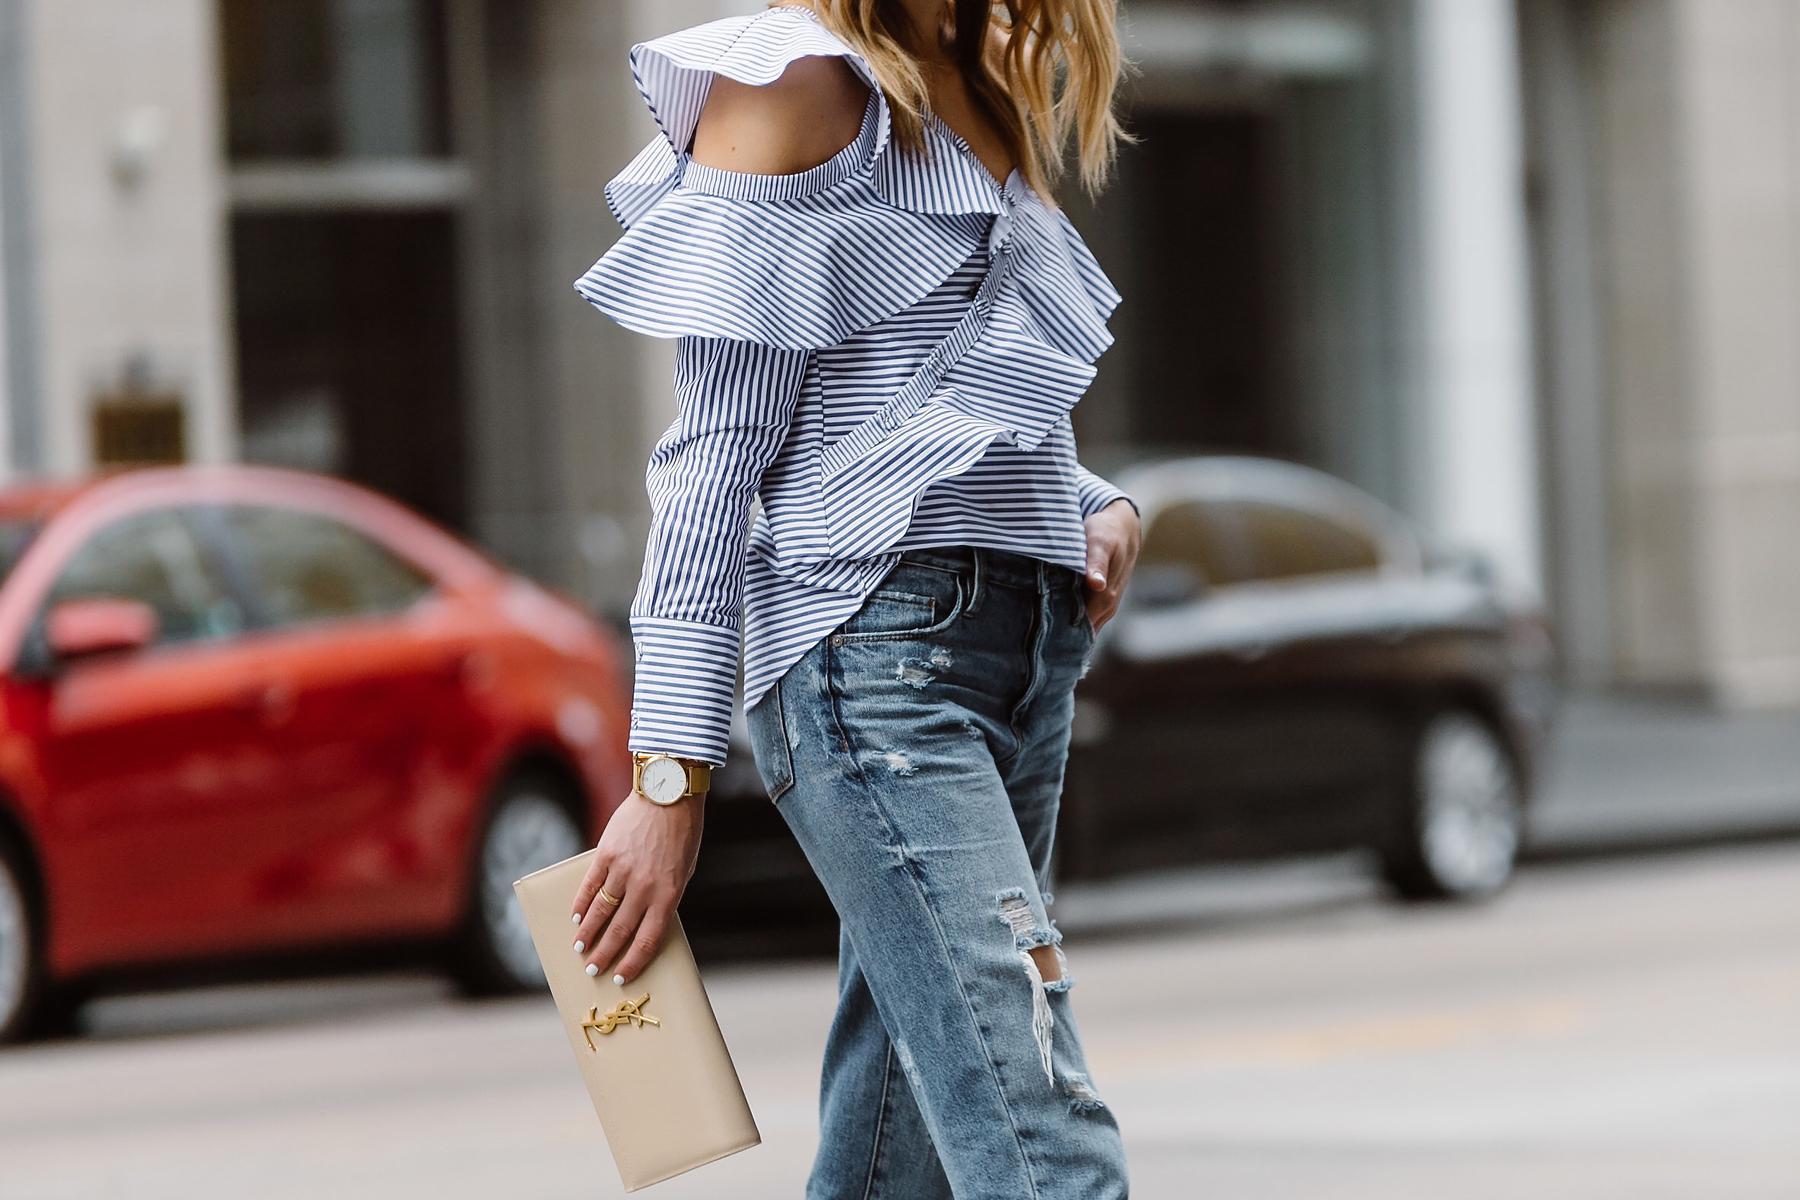 Fashion Jackson, Dallas Blogger, Fashion Blogger, Street Style, Self-Portrait Asymmetrical Ruffle Top, Blue White Stripe Top, Blanknyc Ms Throwback Relaxed Denim Ripped Jeans, Saint Laurent Monogram Clutch